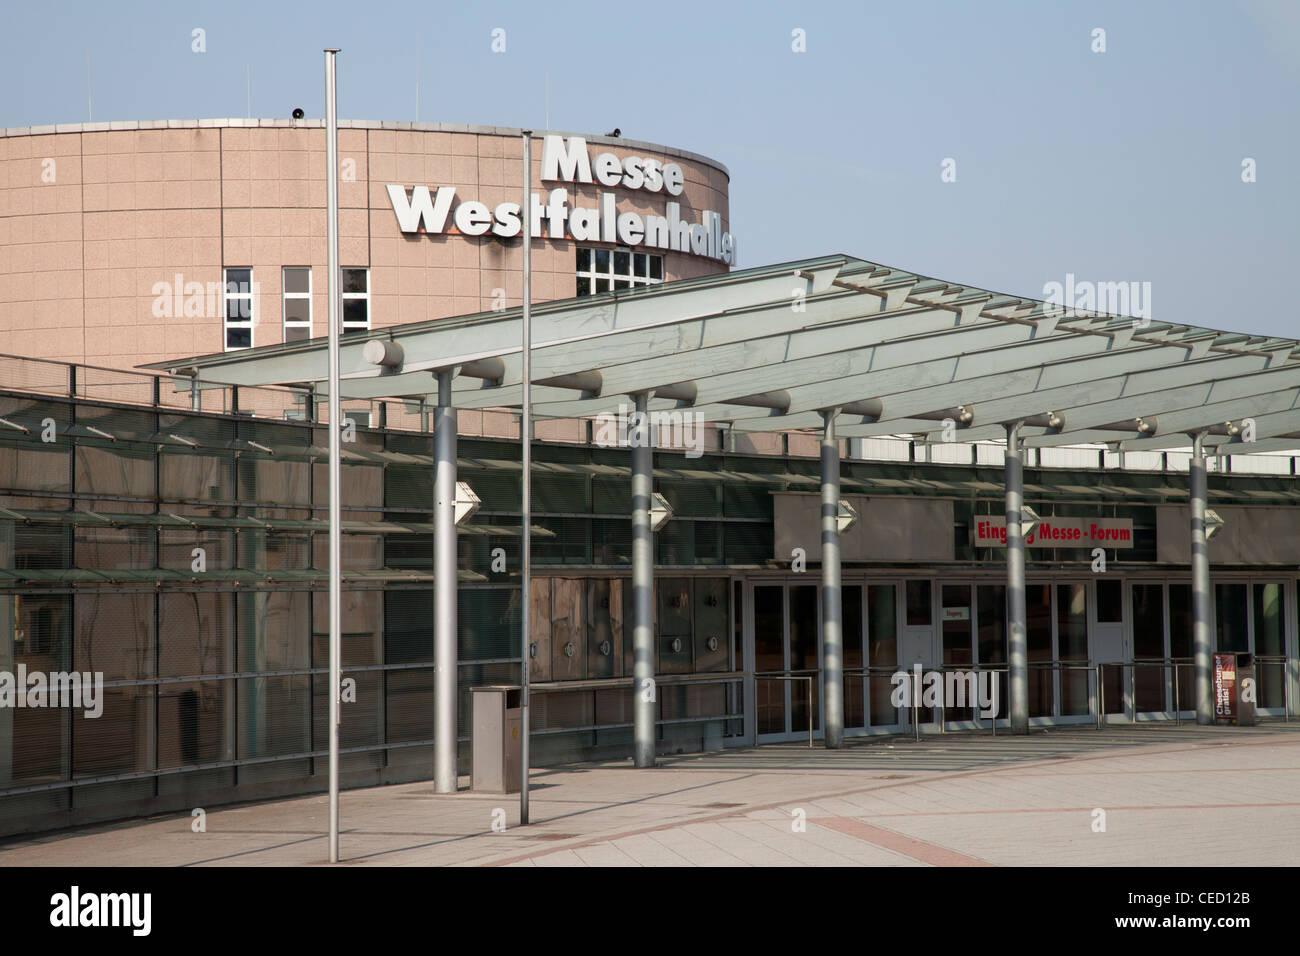 Westfalenhallen, Trade Fair Centre, Dortmund, Ruhr area, North Rhine-Westphalia, Germany, Europe - Stock Image